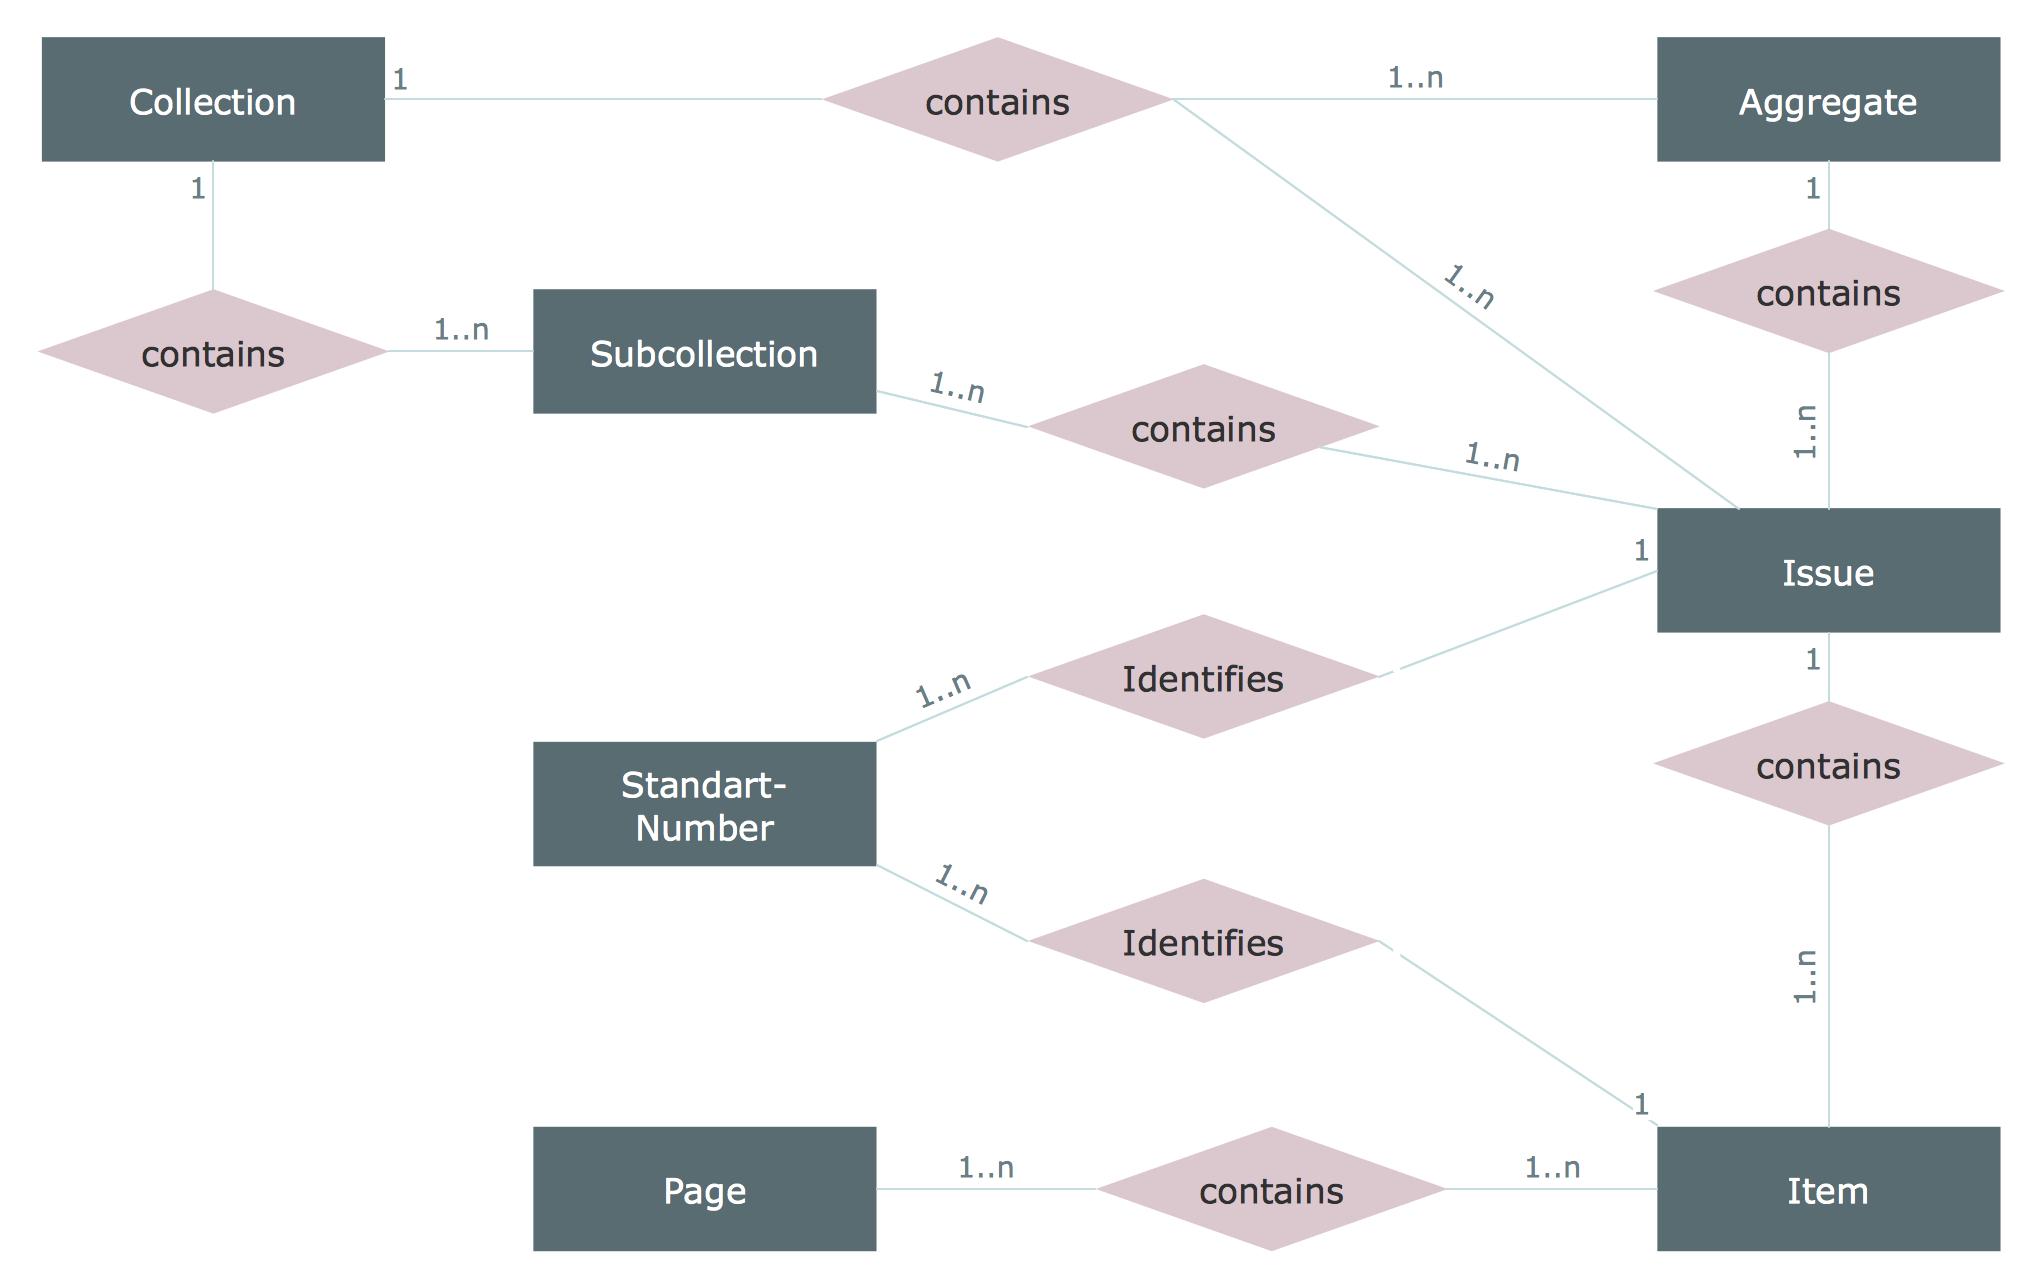 Entity Relationship Diagram (Erd) Solution | Conceptdraw in Entity Relationship Diagram Examples With Solutions